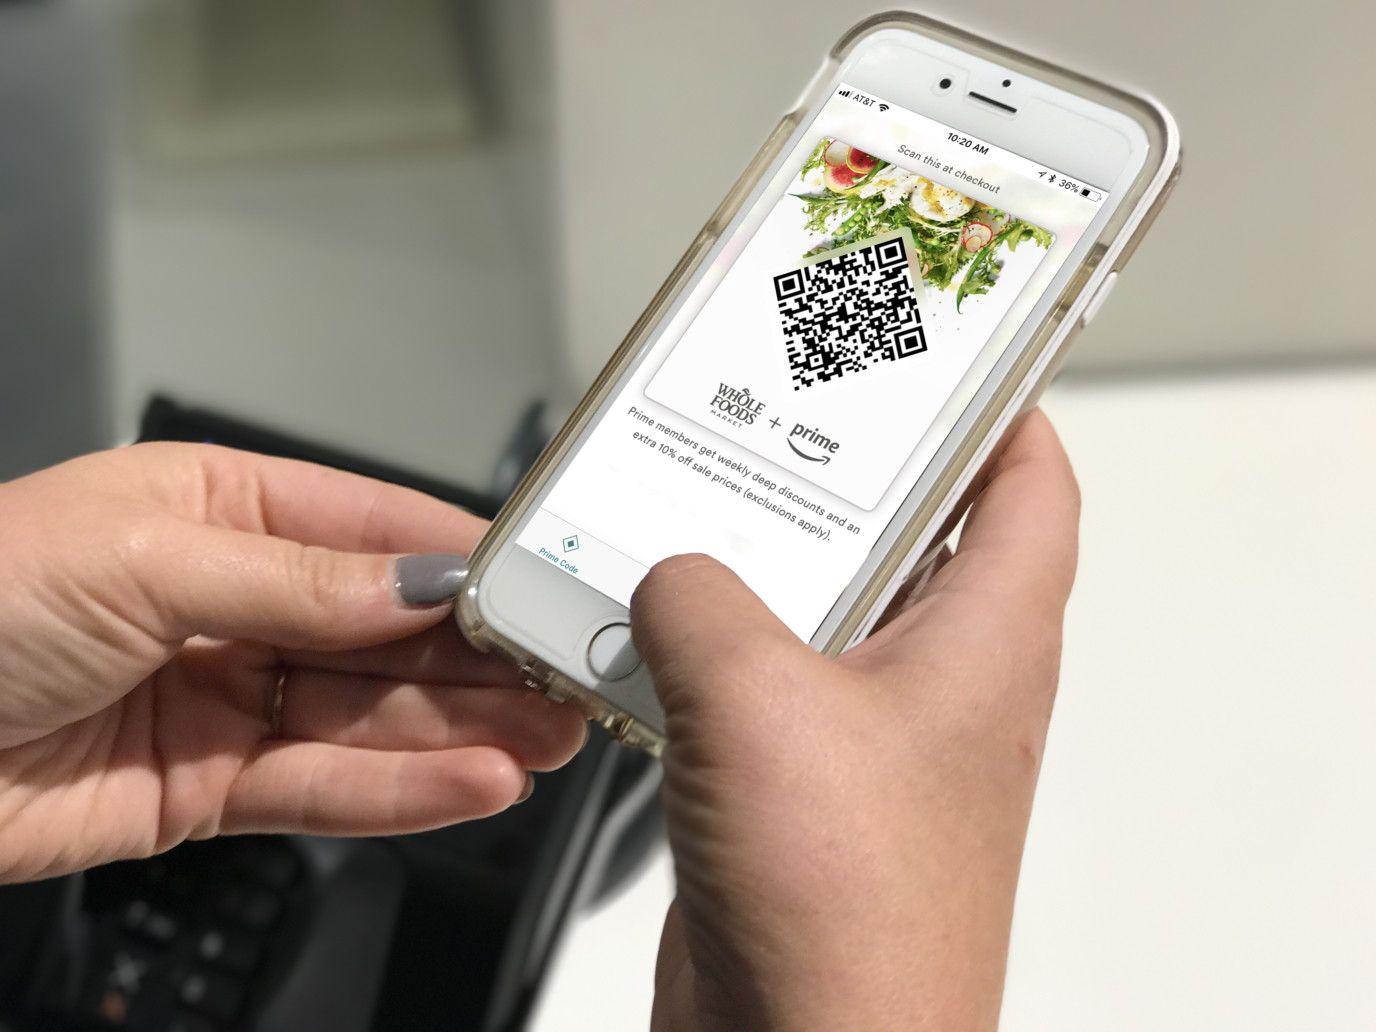 Amazon Prime Members Get Steep Discounts At Whole Foods Whole Food Recipes Whole Foods App Food